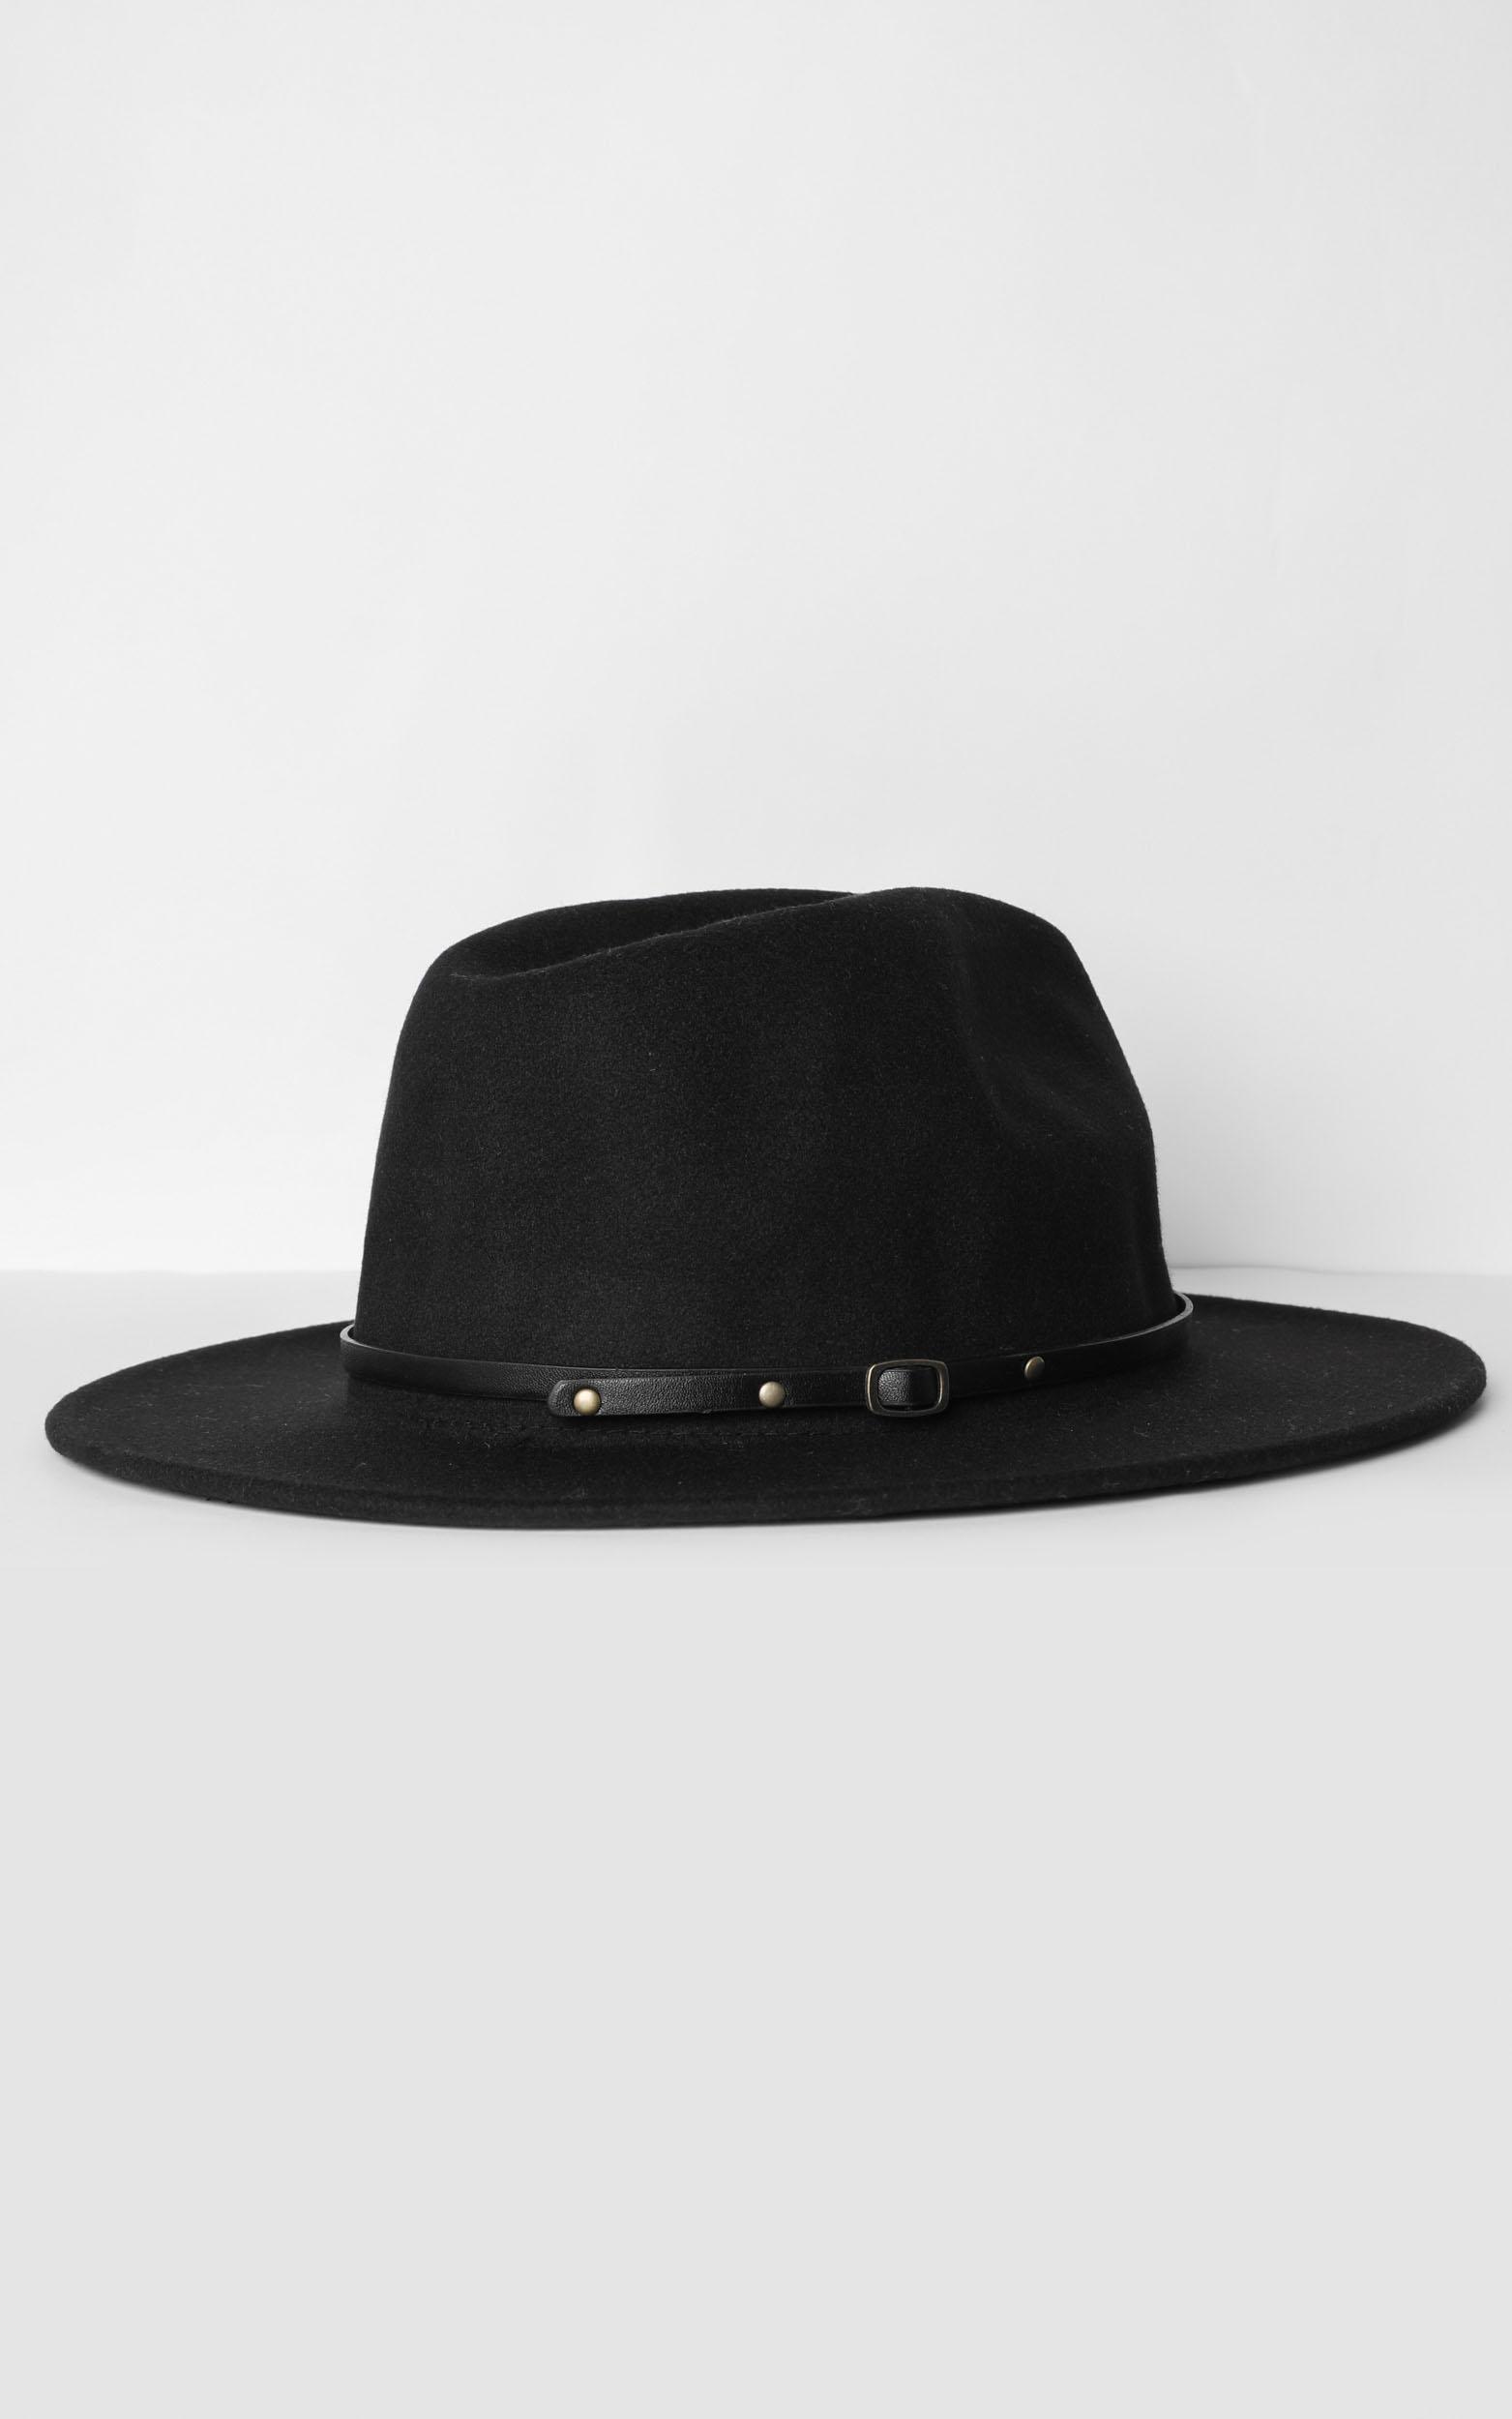 No Brainer Hat in Black, , hi-res image number null